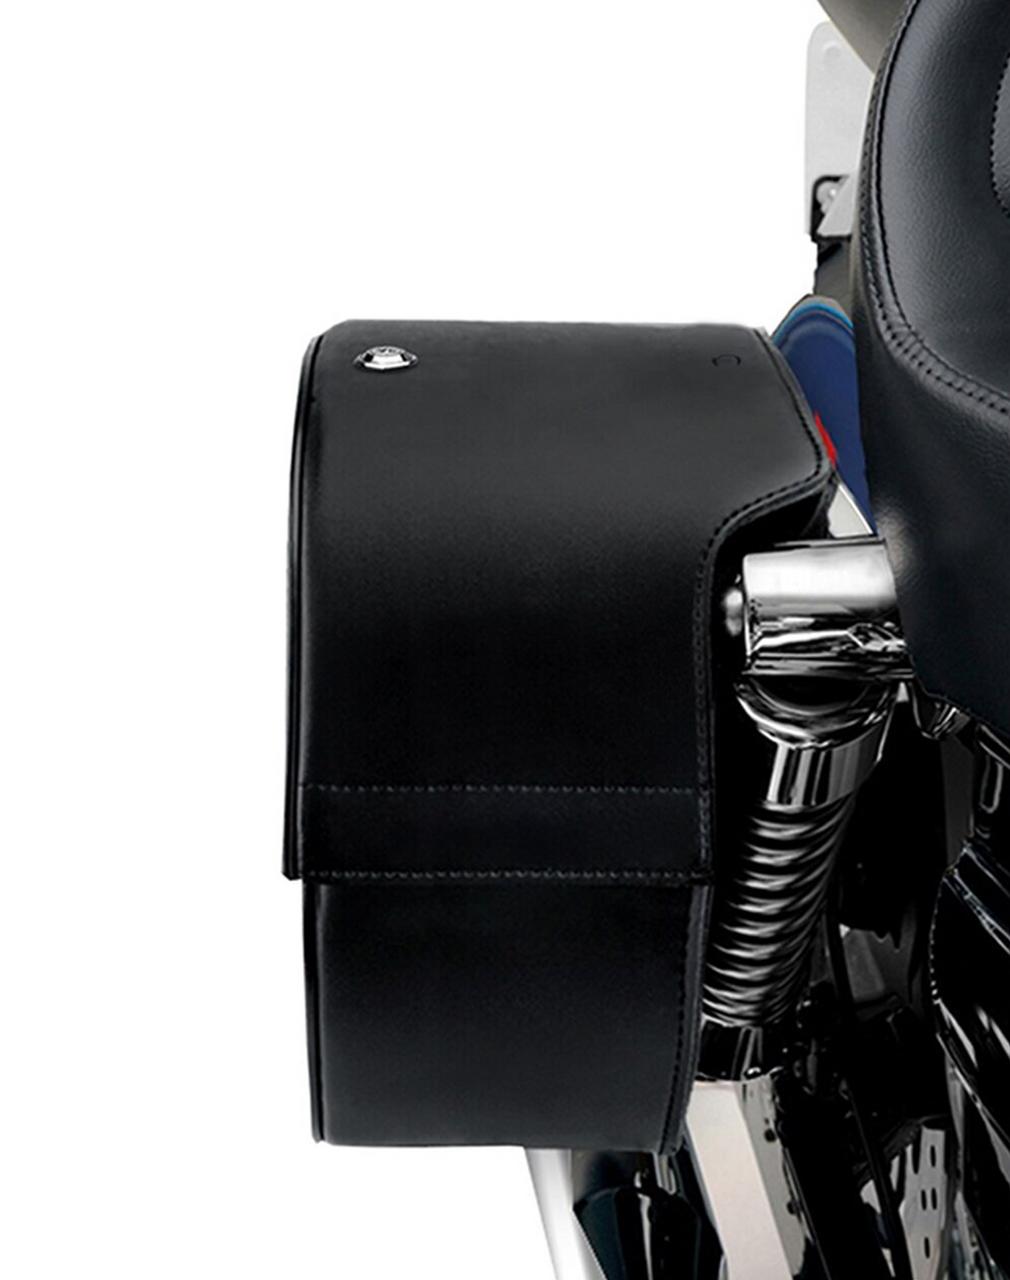 Viking shock Cutout Slanted Large Motorcycle Saddlebags For Harley Dyna Switchback Shock Cutout View